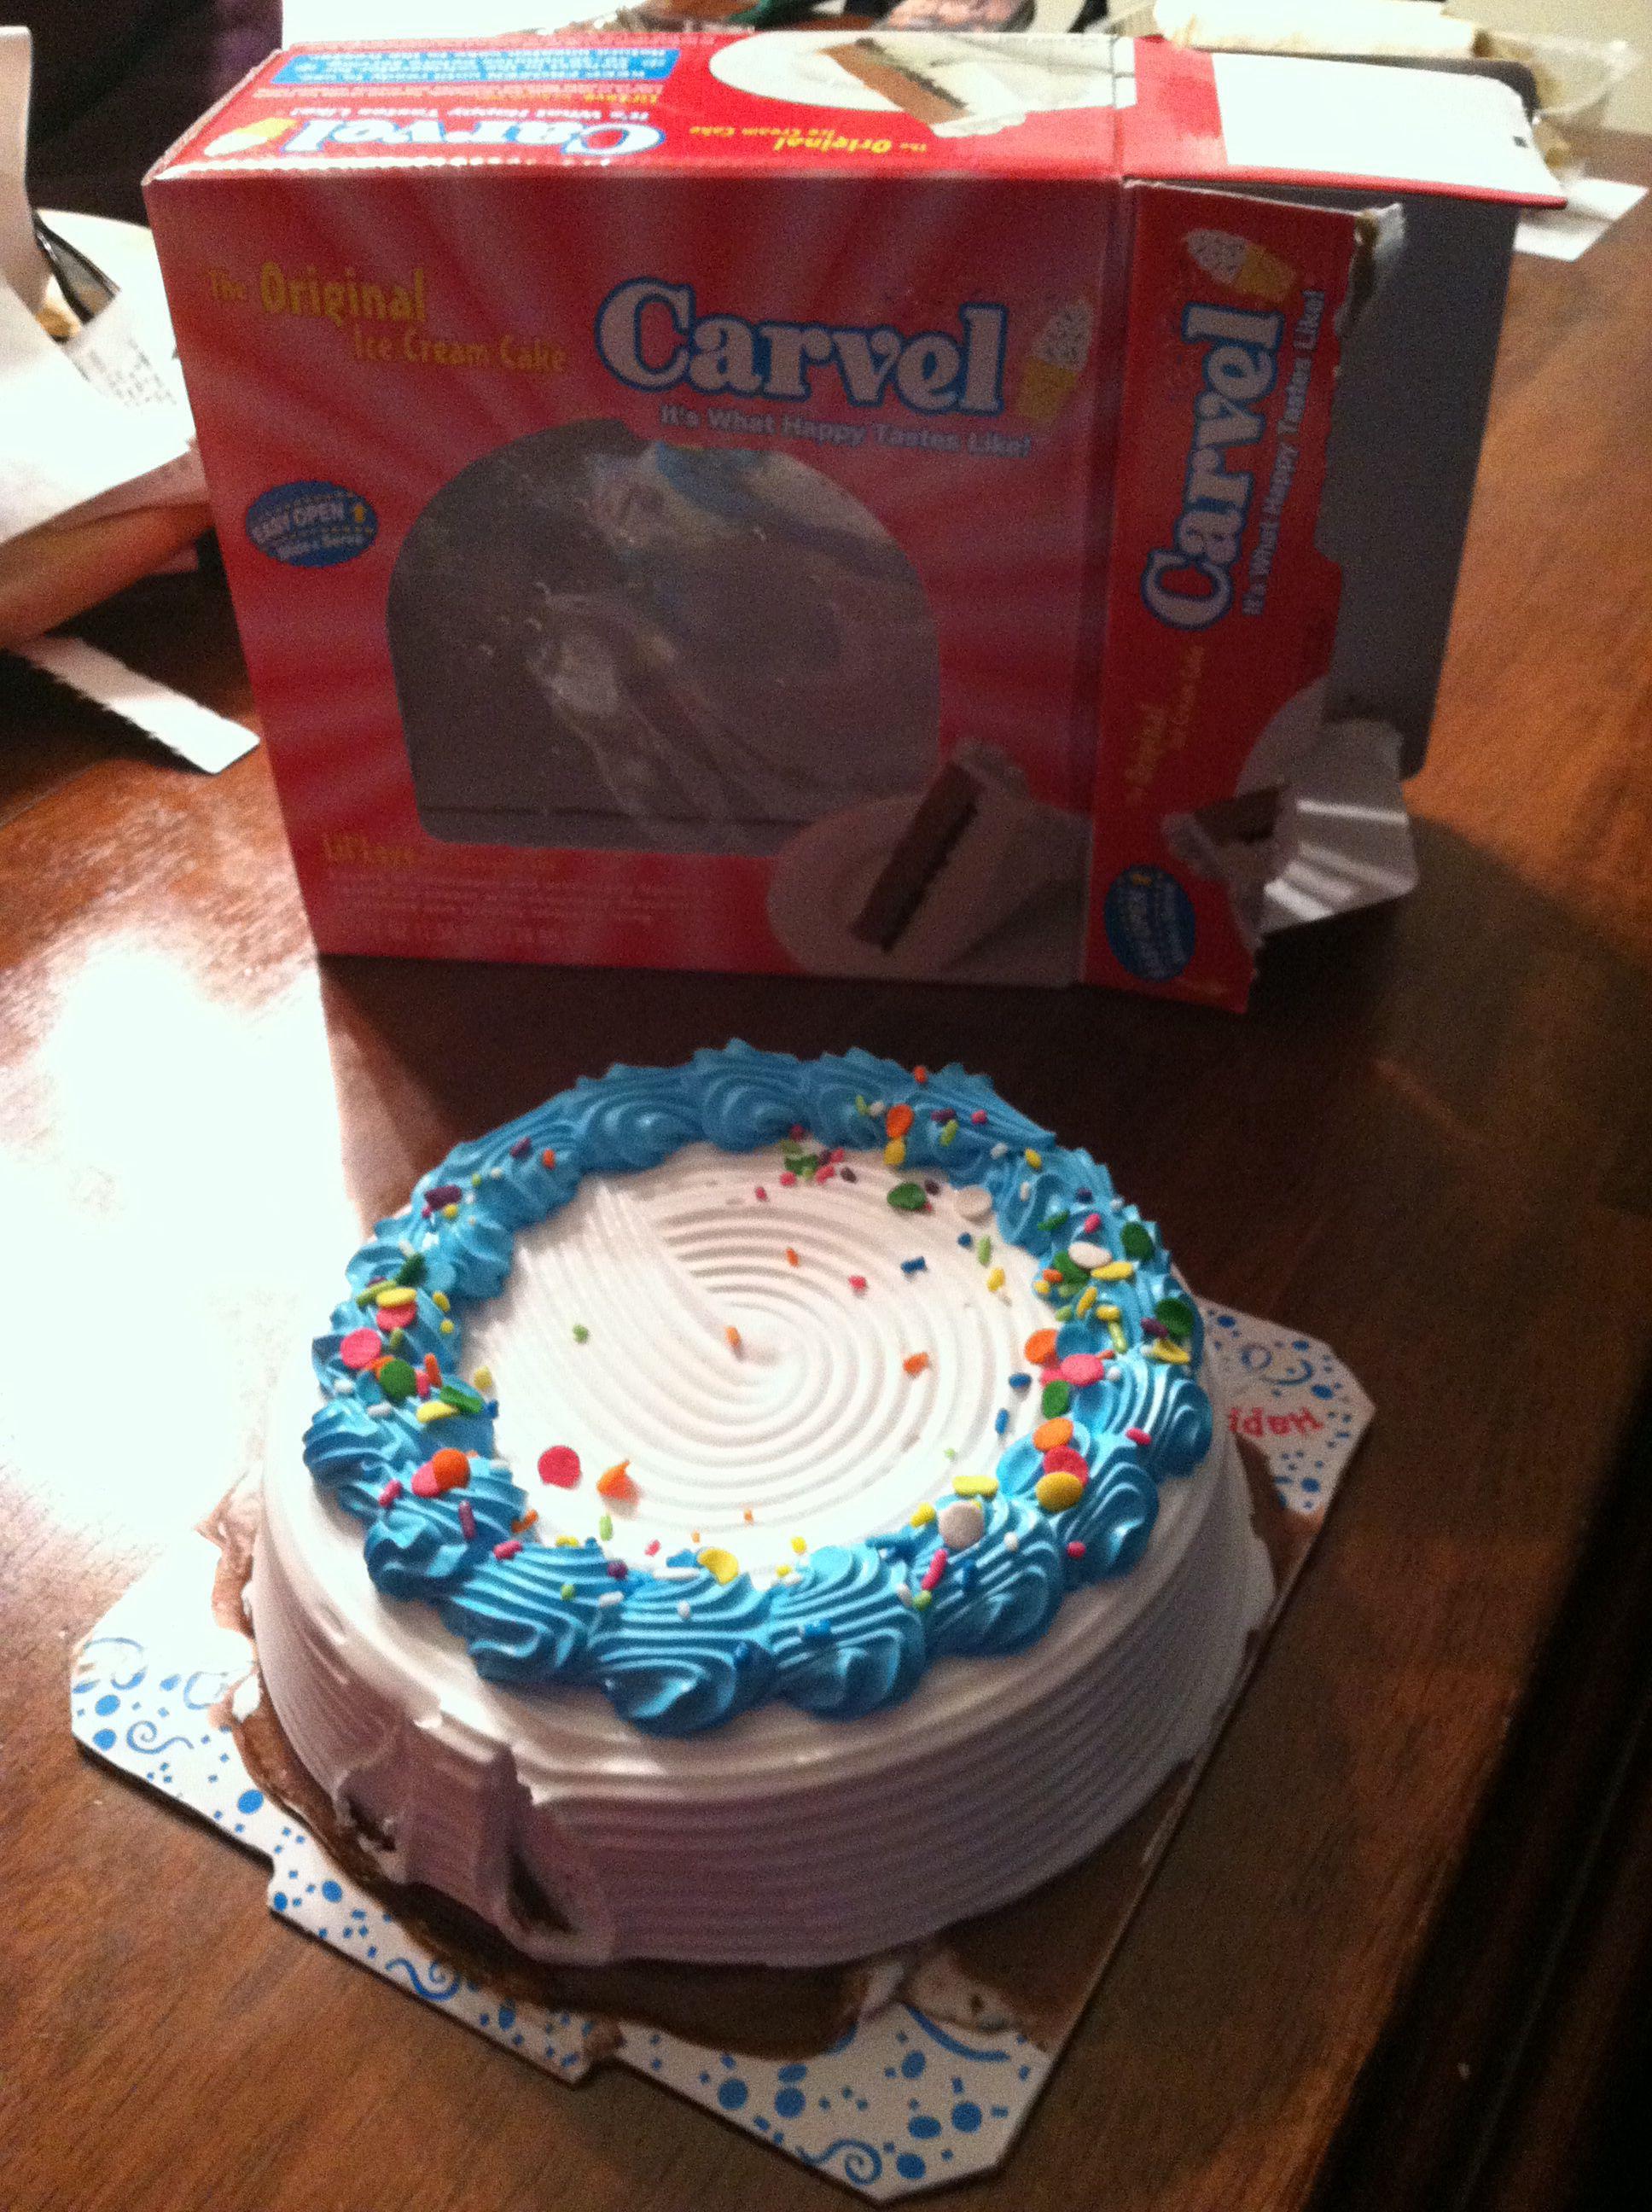 Carvel Ice Cream Cake Carvel Pinterest Carvel Ice Cream Cake